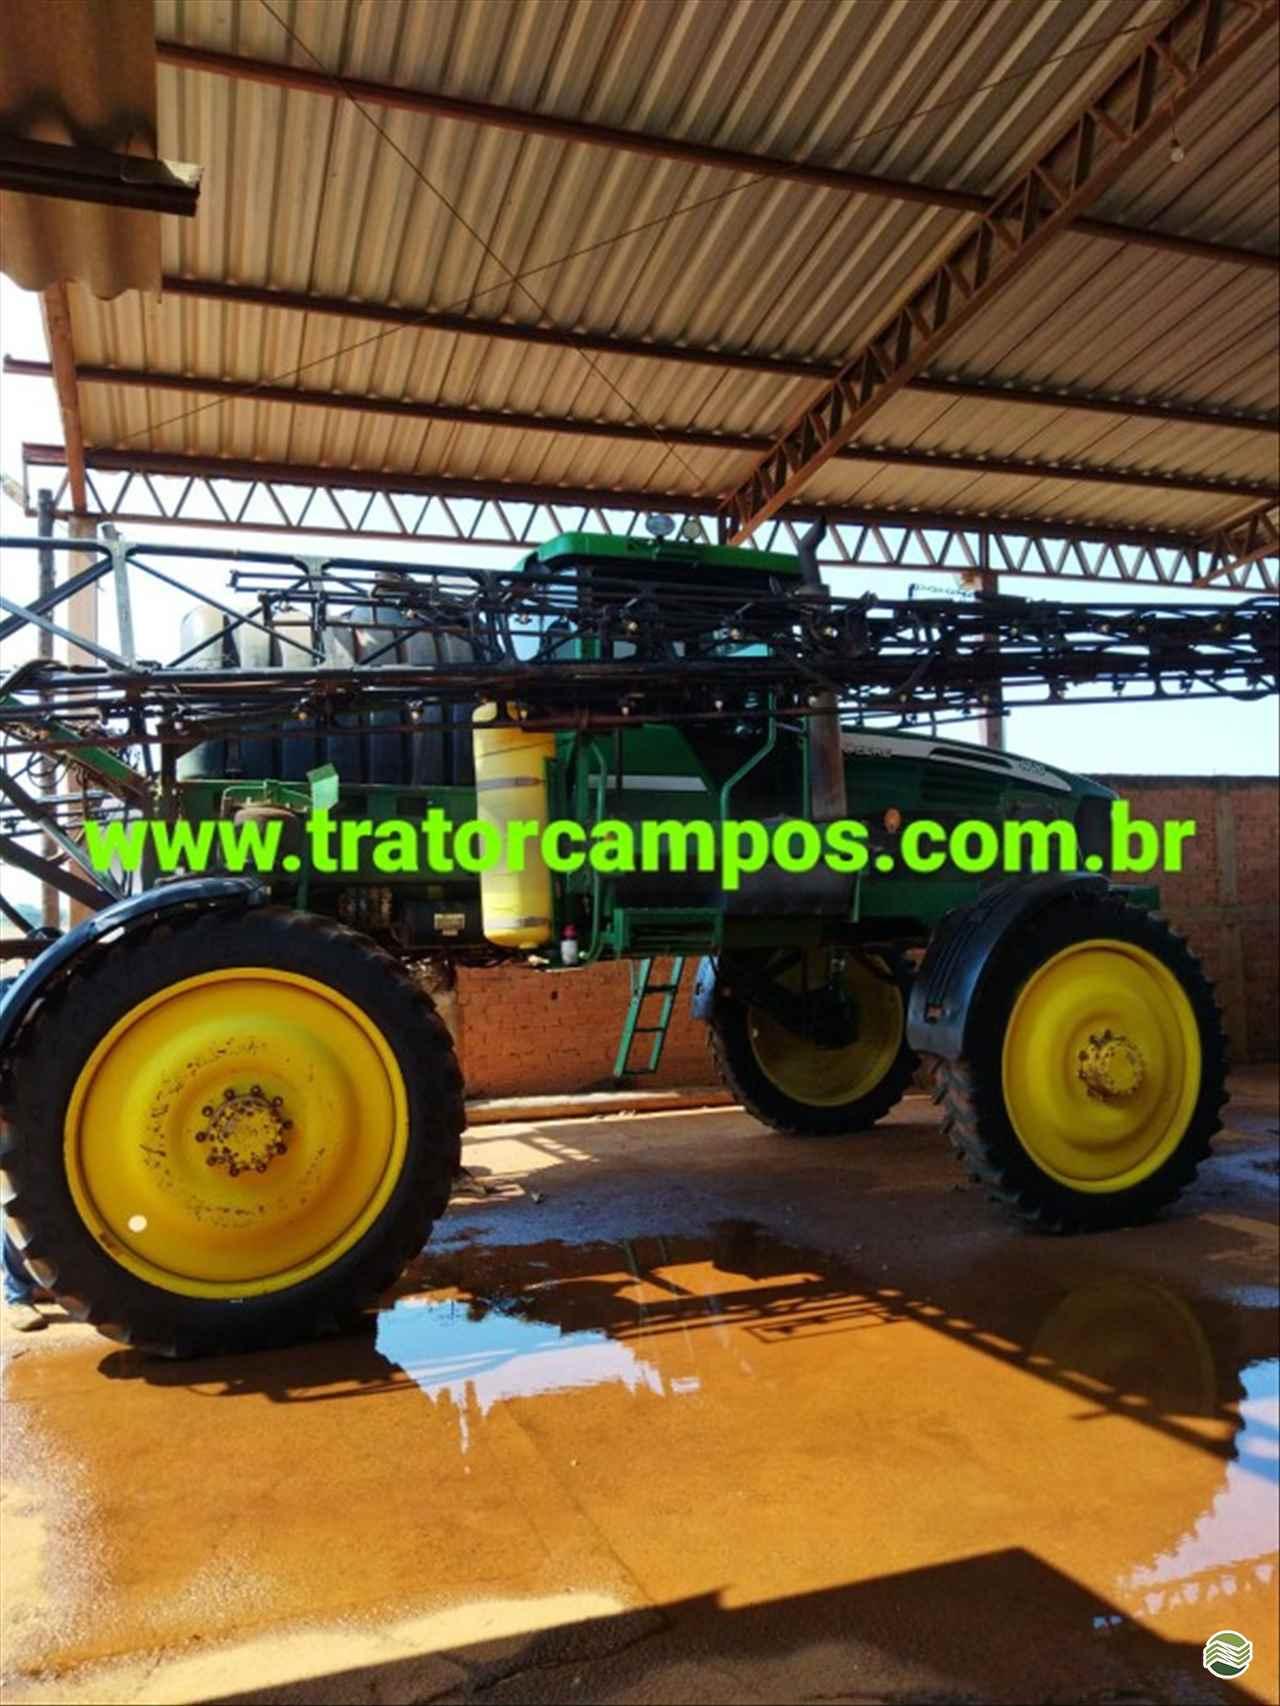 JOHN DEERE 4720 de Trator Campos - GUAPO/GO